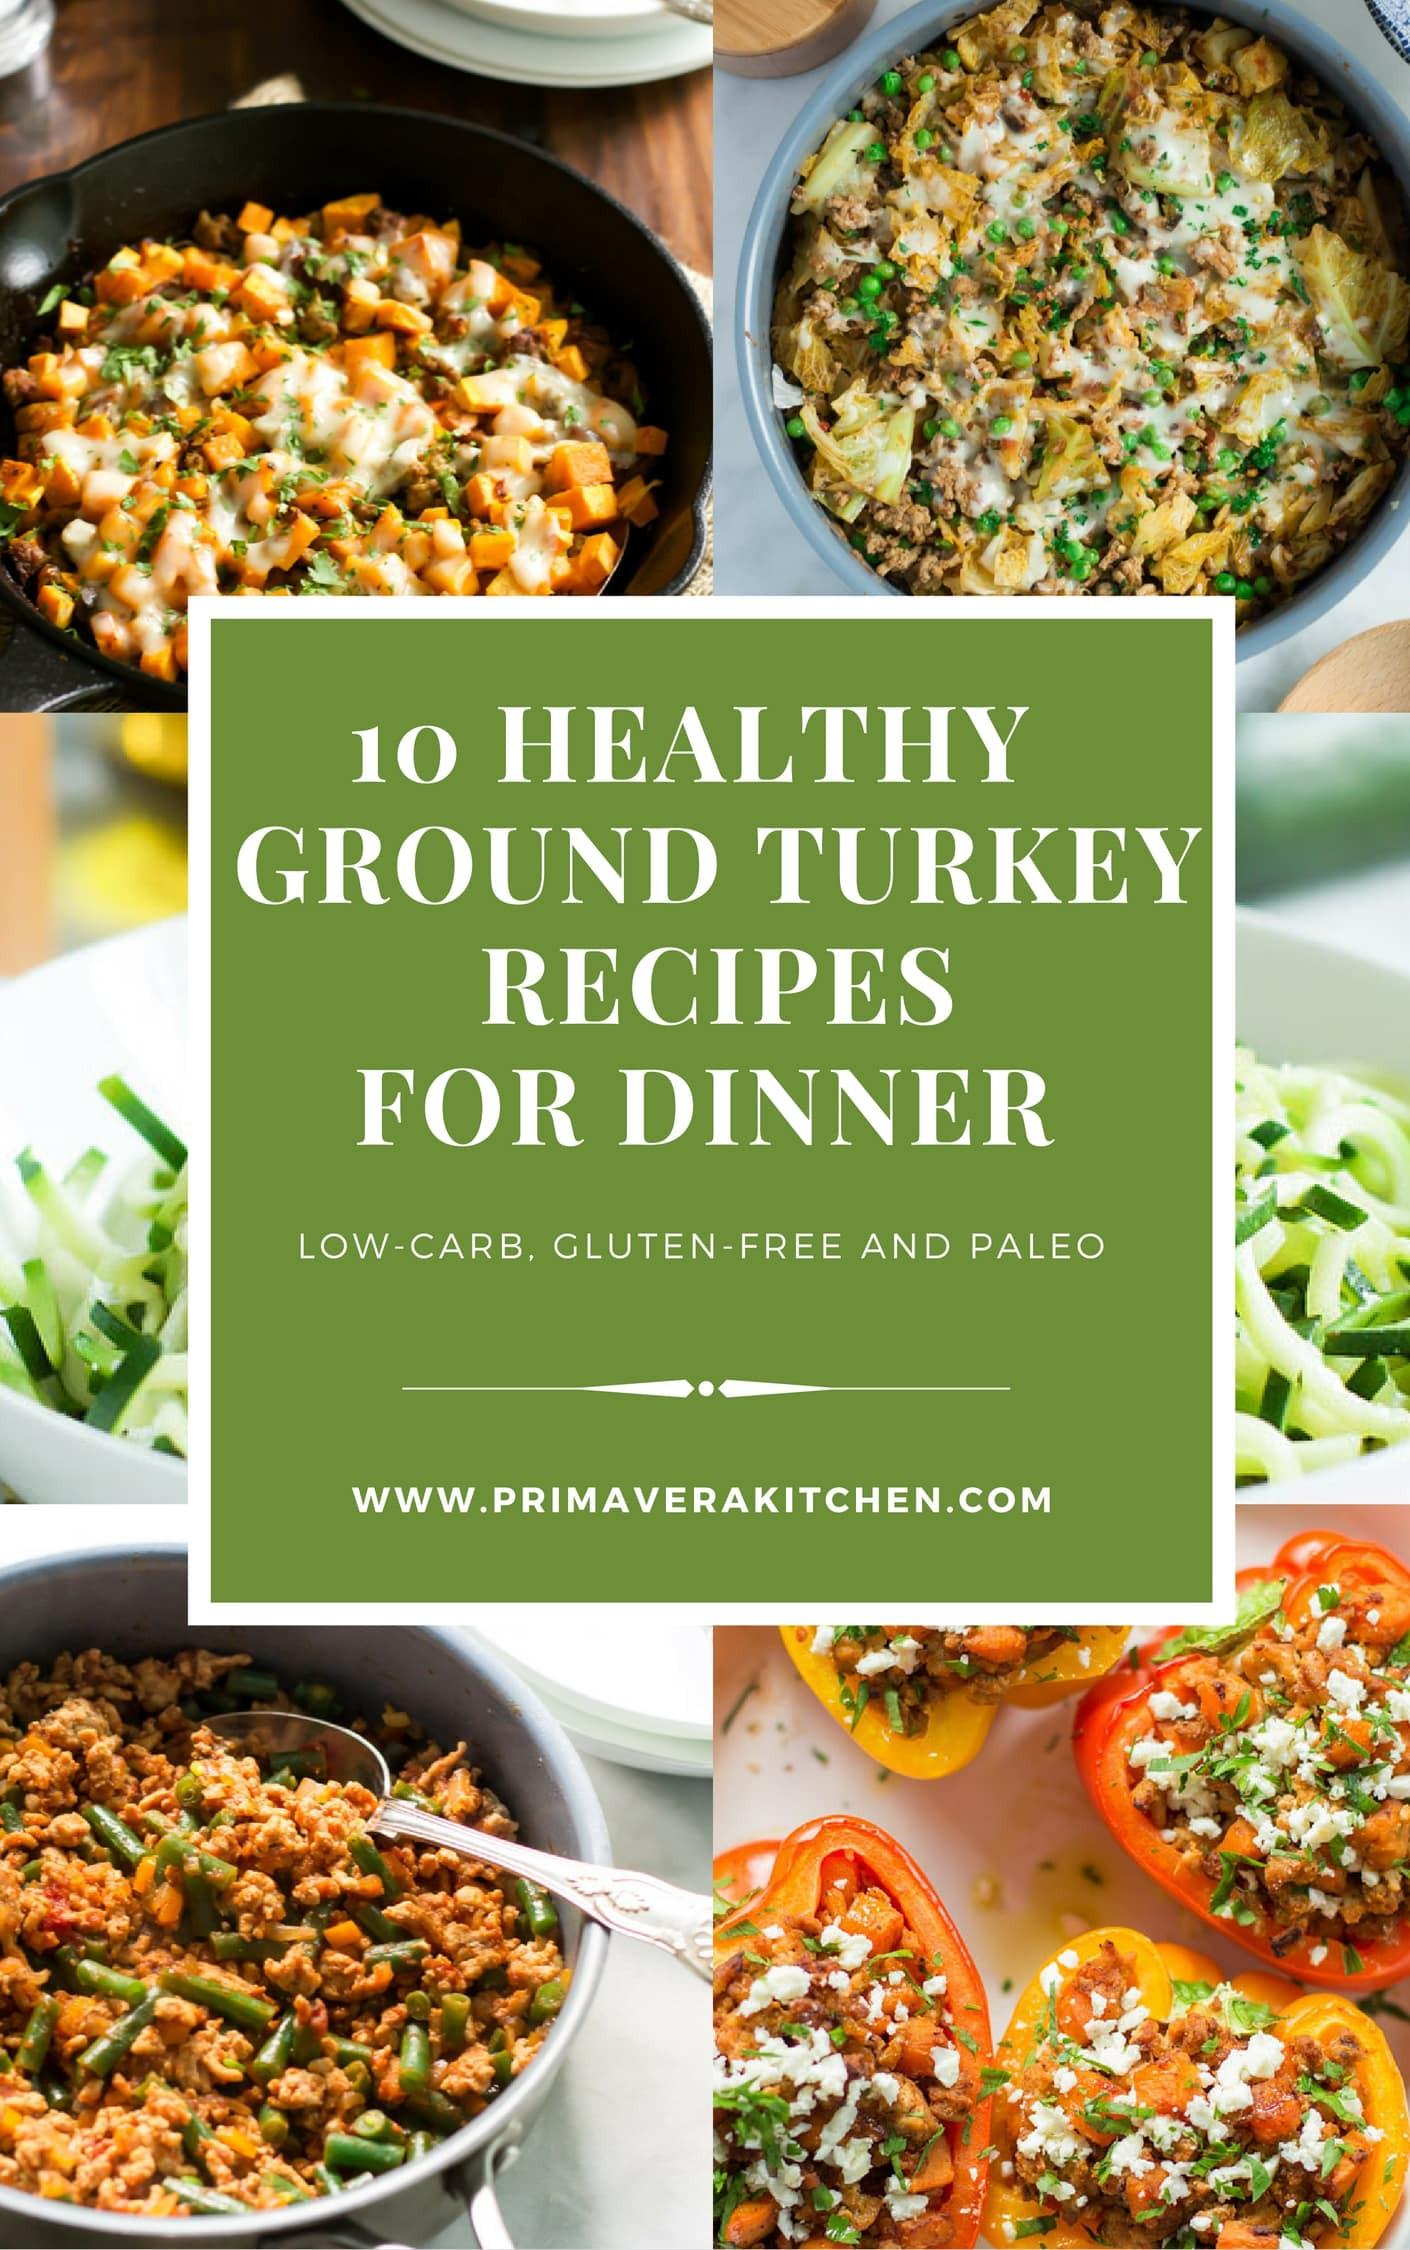 Healthy Meals With Ground Turkey  10 Healthy Ground Turkey Recipes for Dinner Primavera